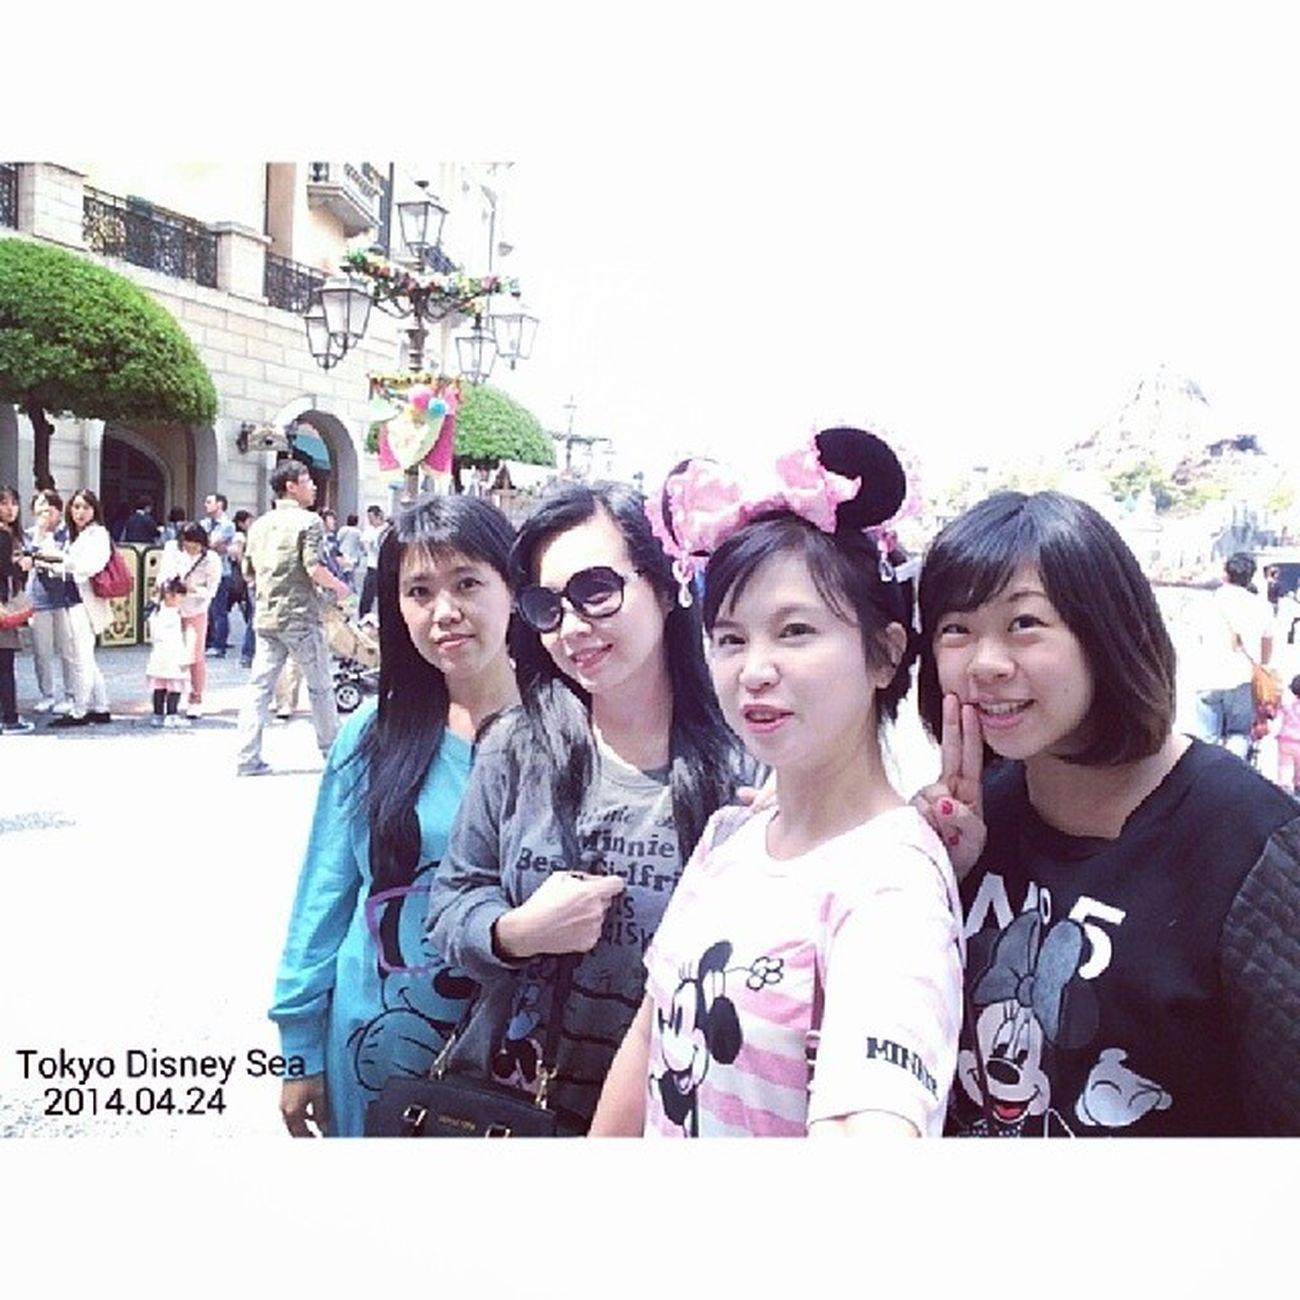 Tokyo DisneySea Disney 20140424 Japan Jp Award Trip Privileged Friendship